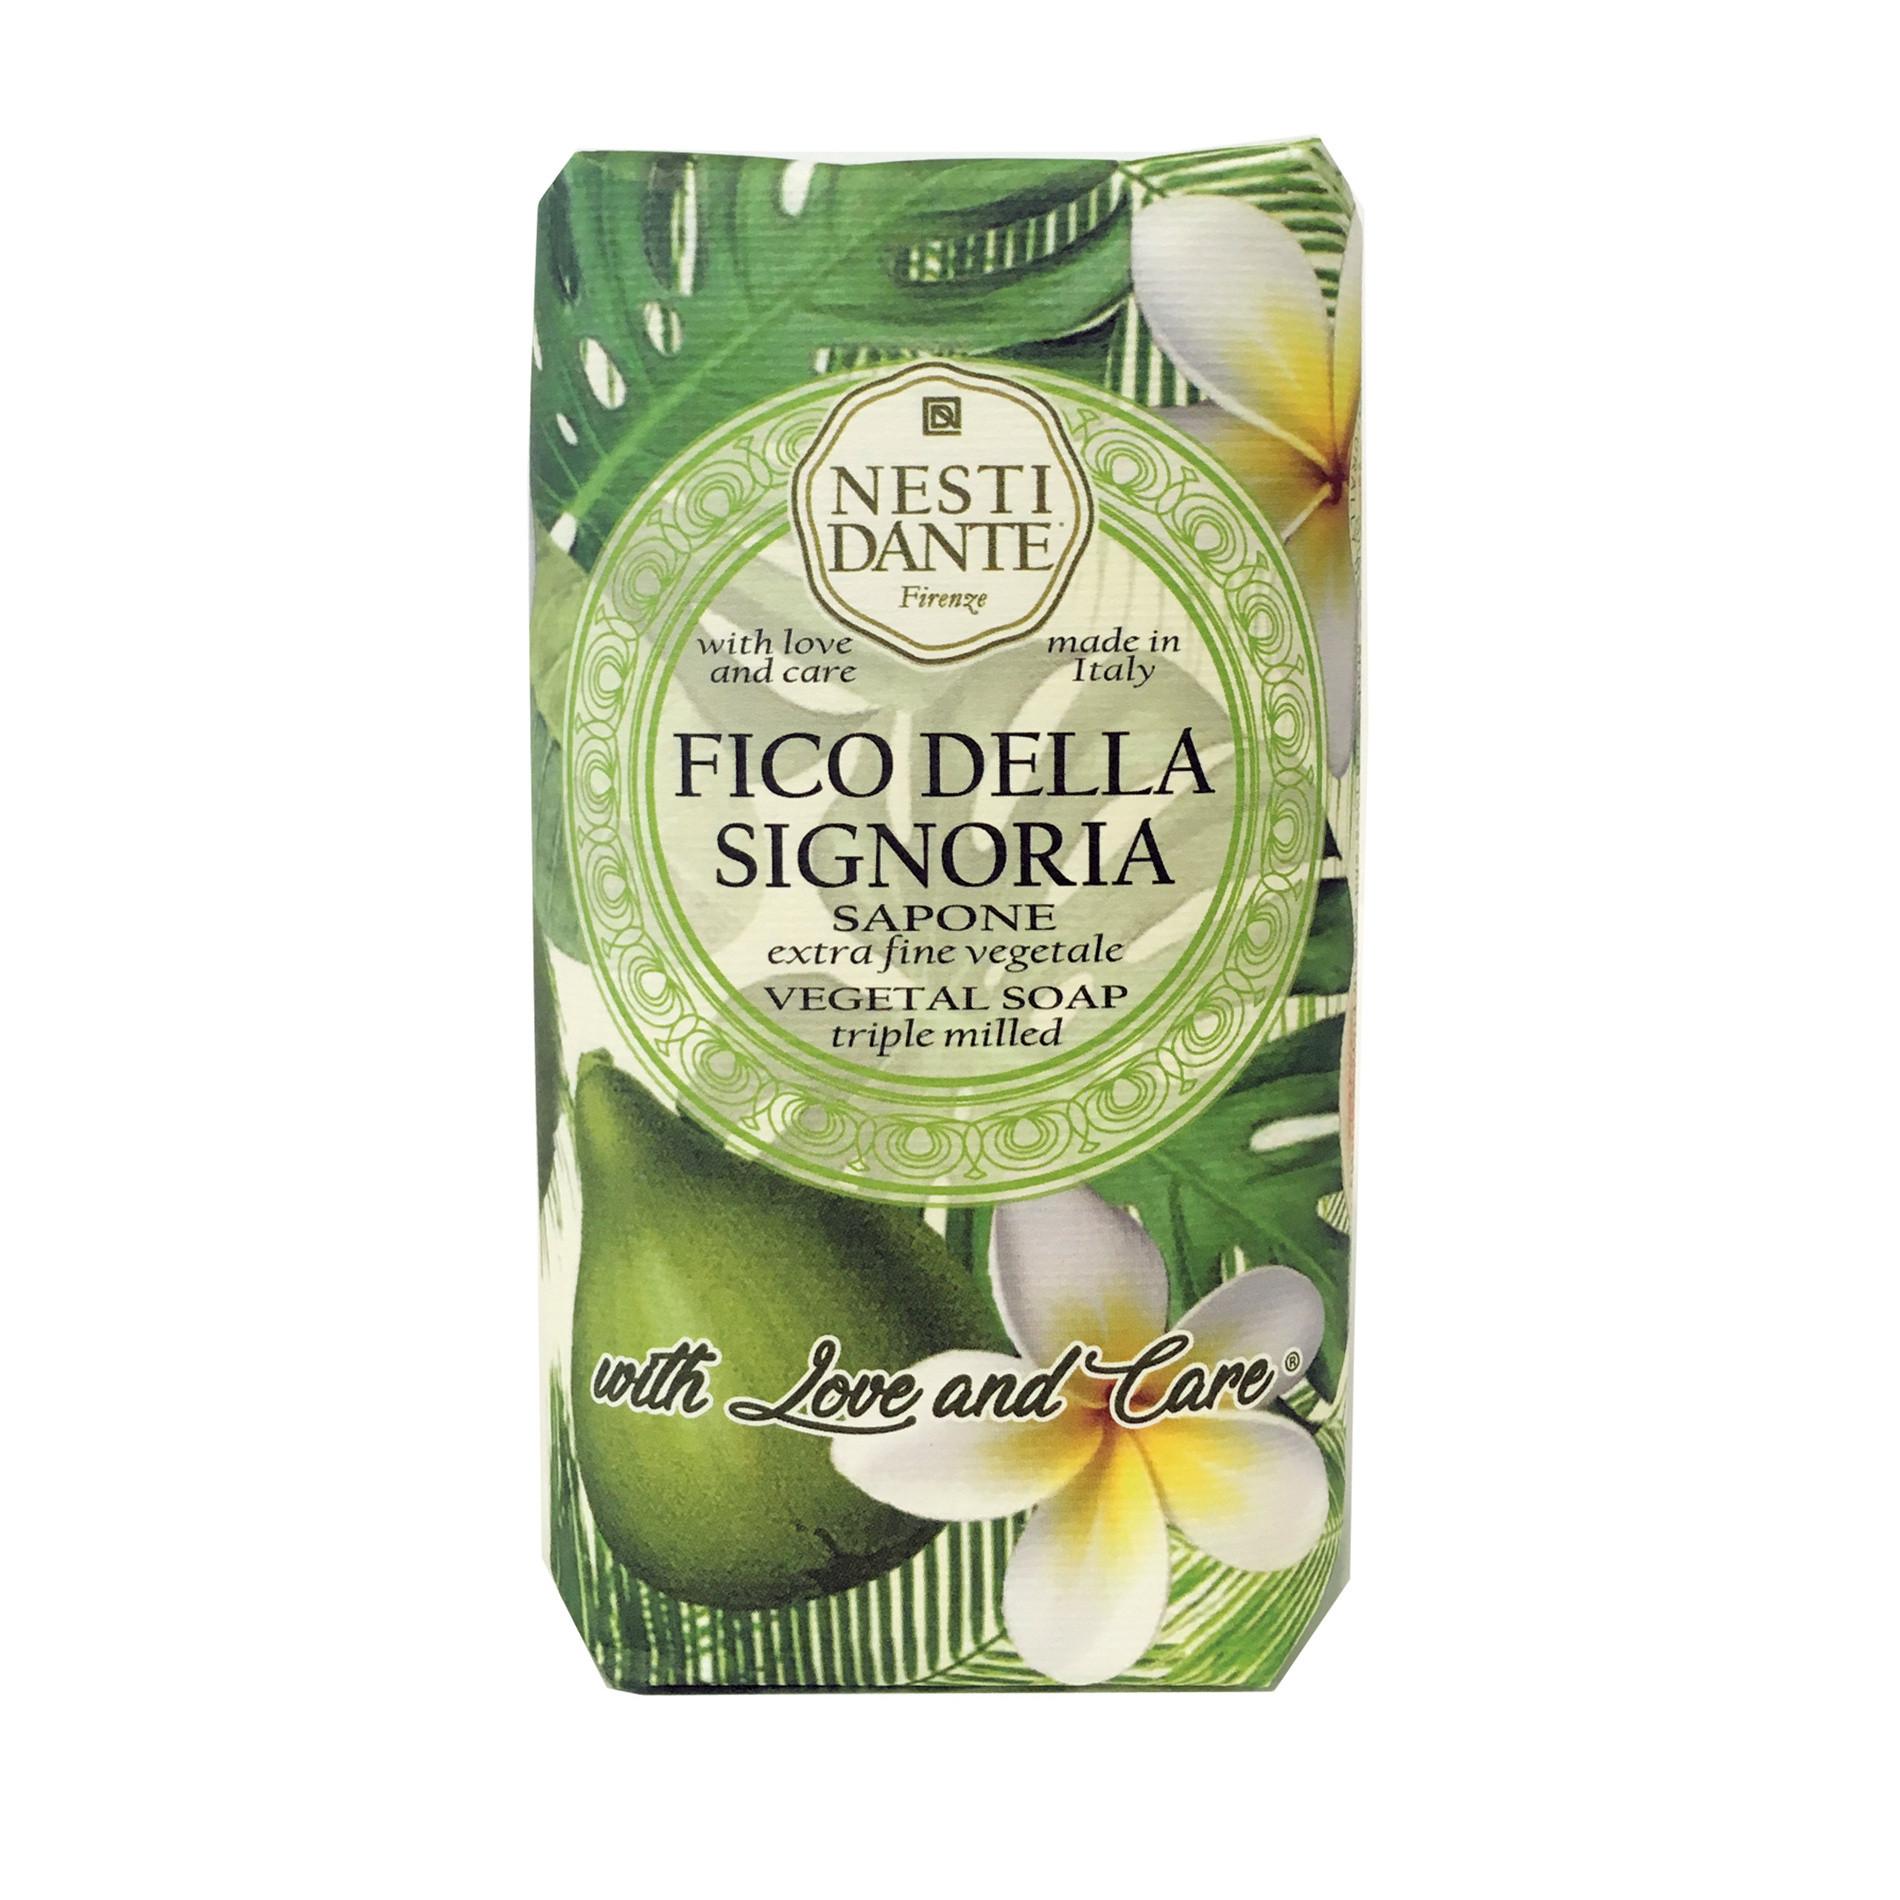 With Love & Care - Fico Della Signoria, Verde, large image number 0